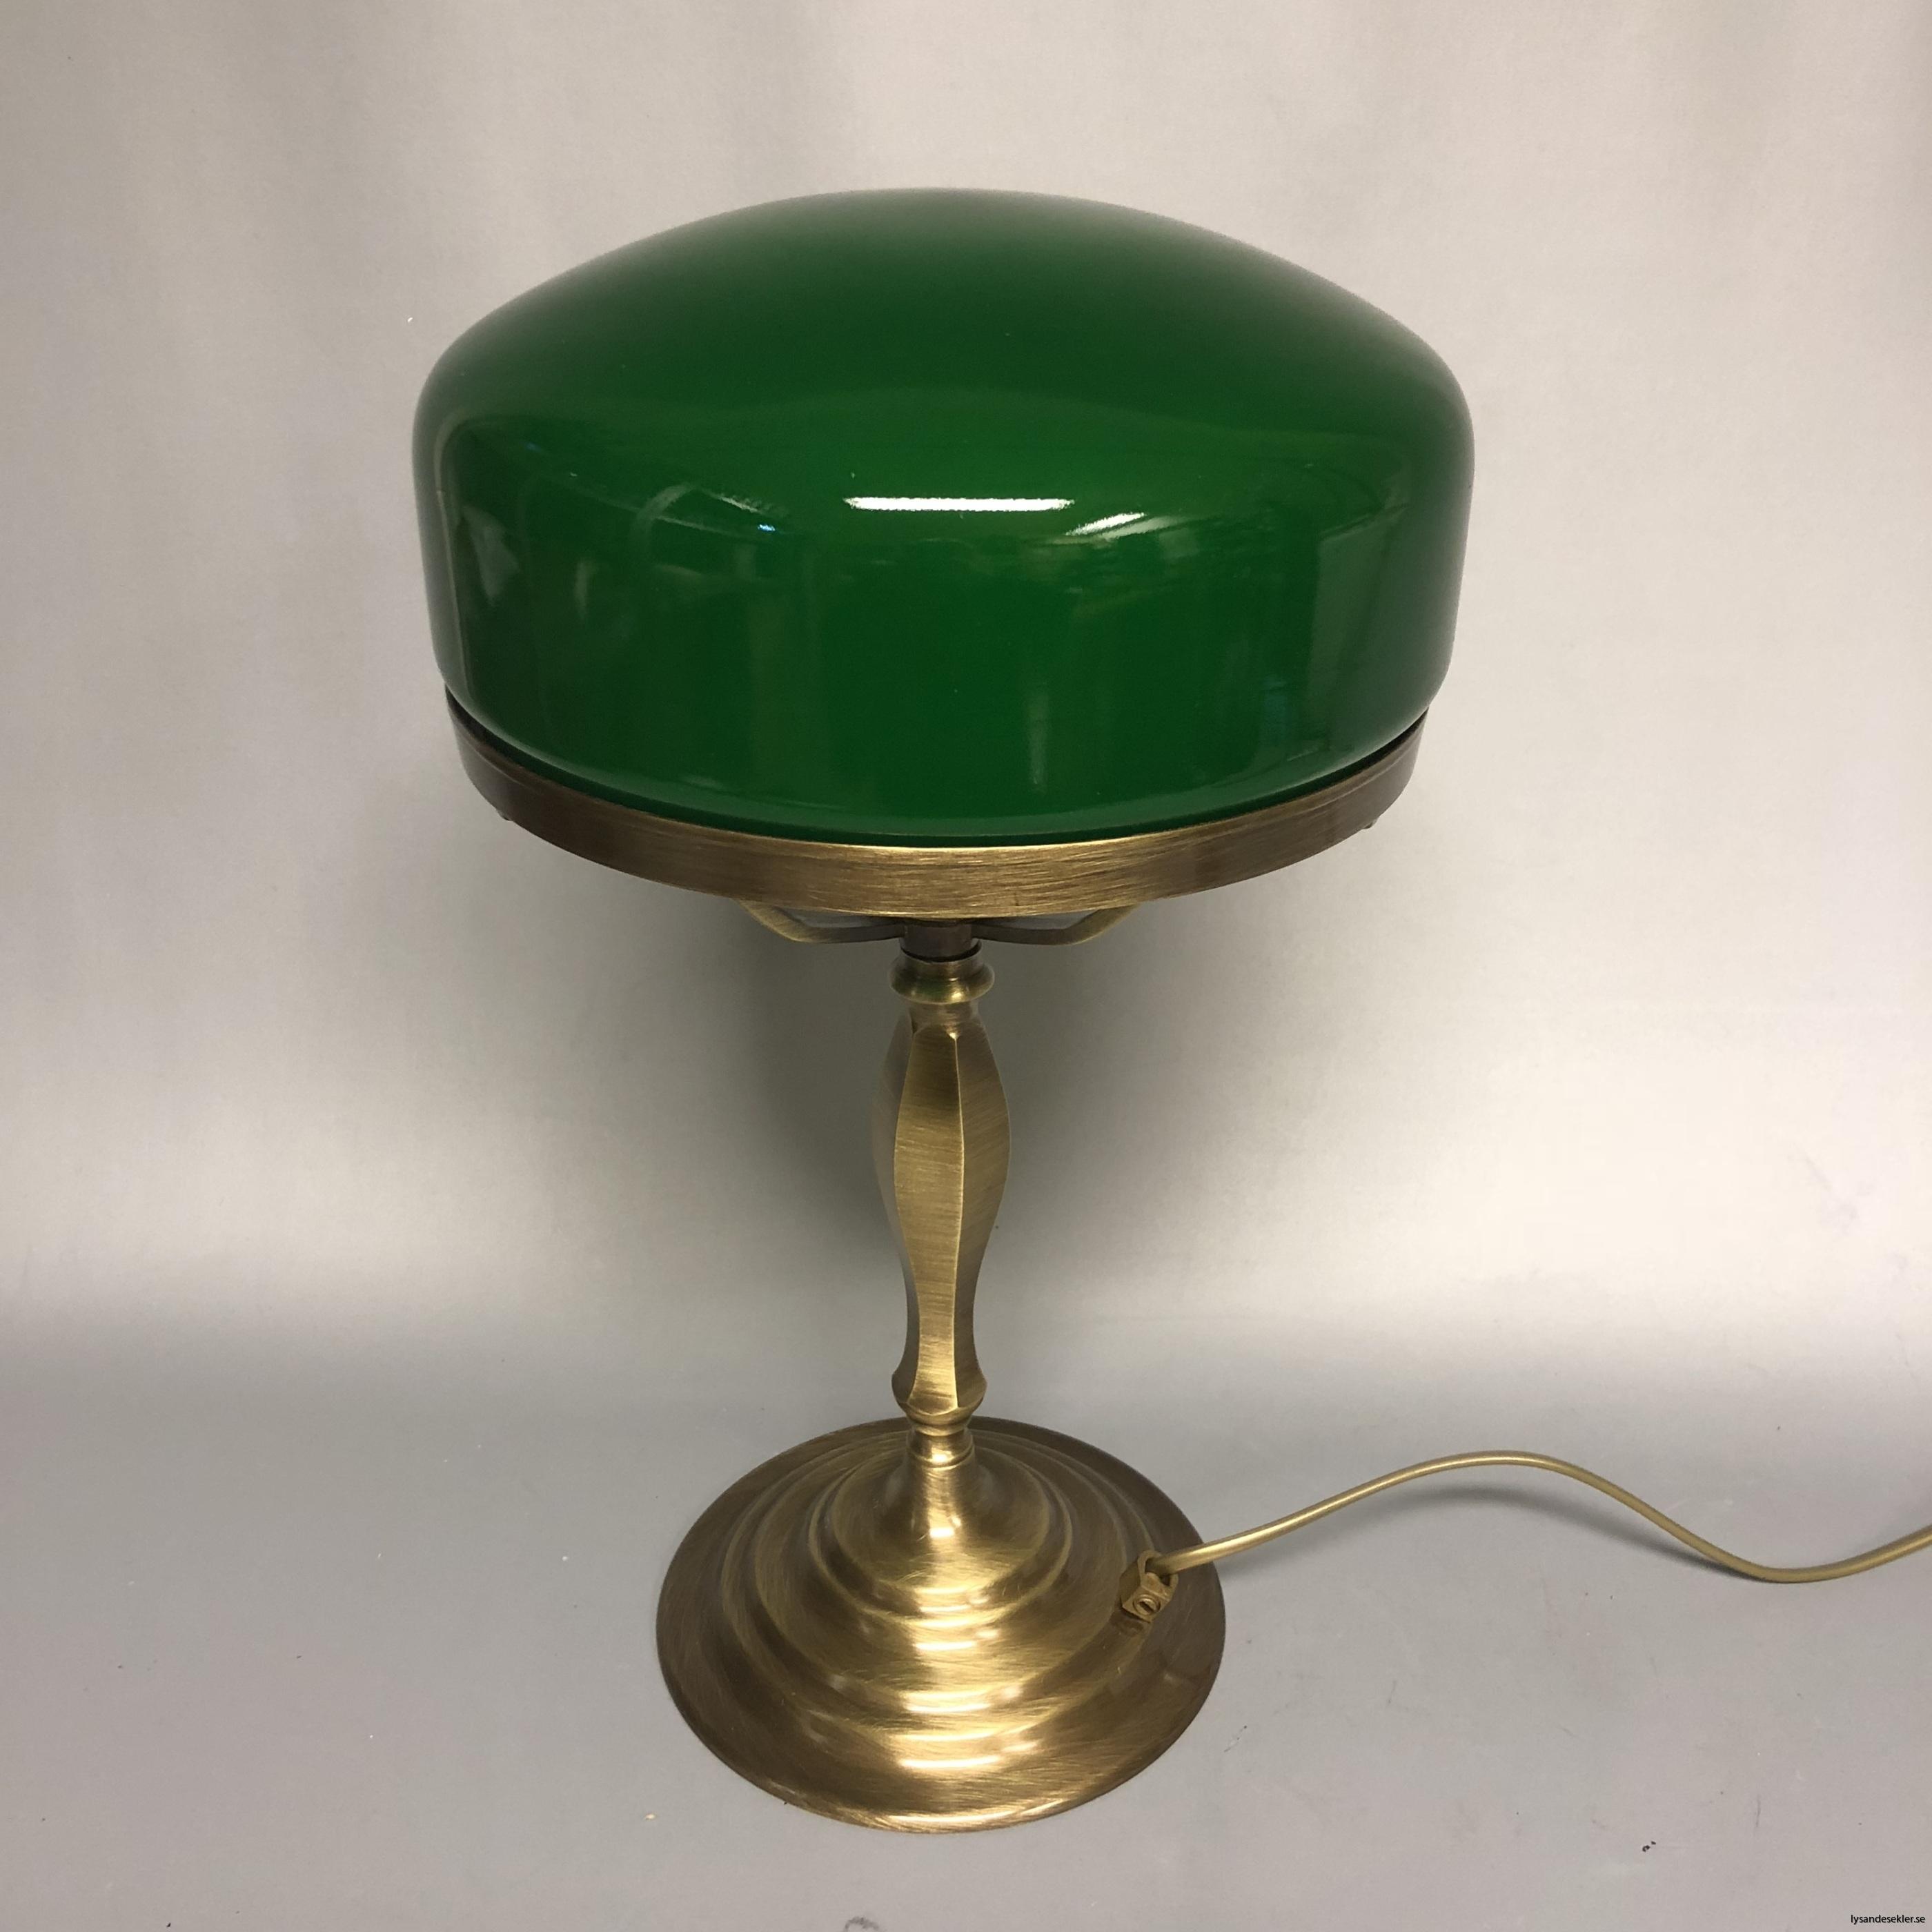 strindbergslampa strindbergslampor strindberg lampa skärm kupa strindbergsskärm strindbergskupa38